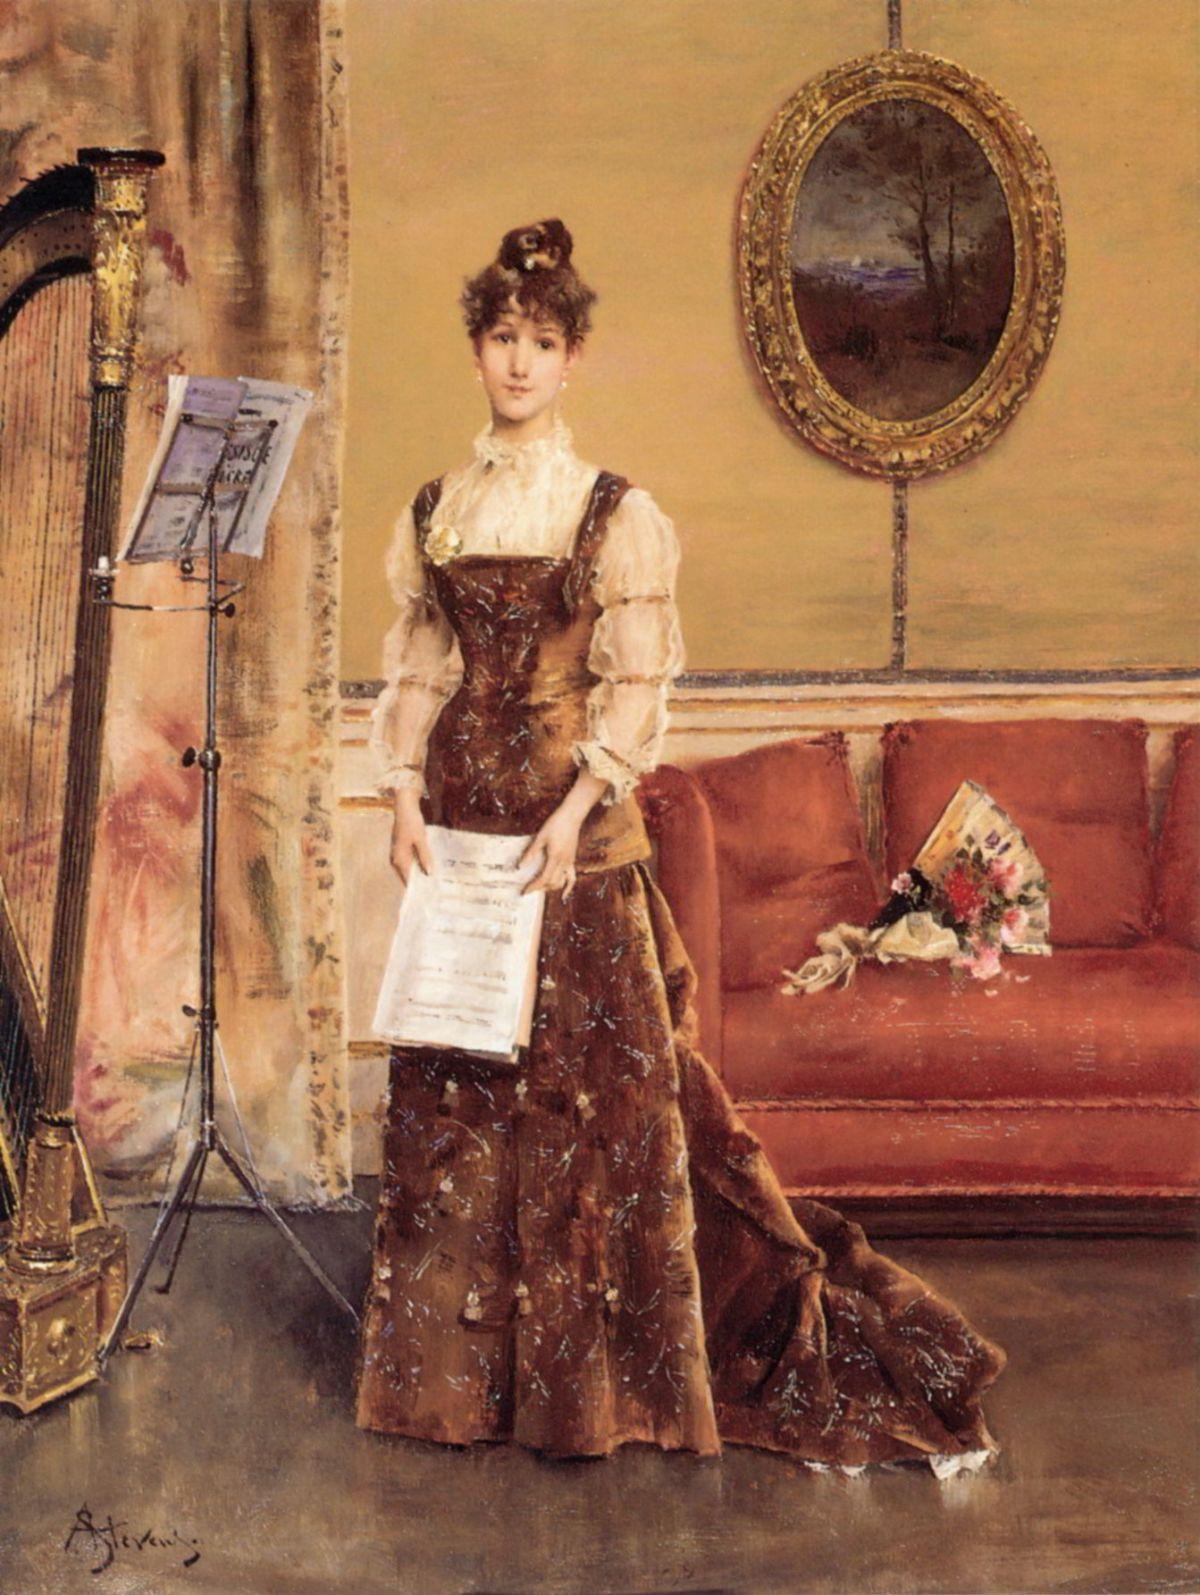 La Femme à la Harpe by Alfred Stevens